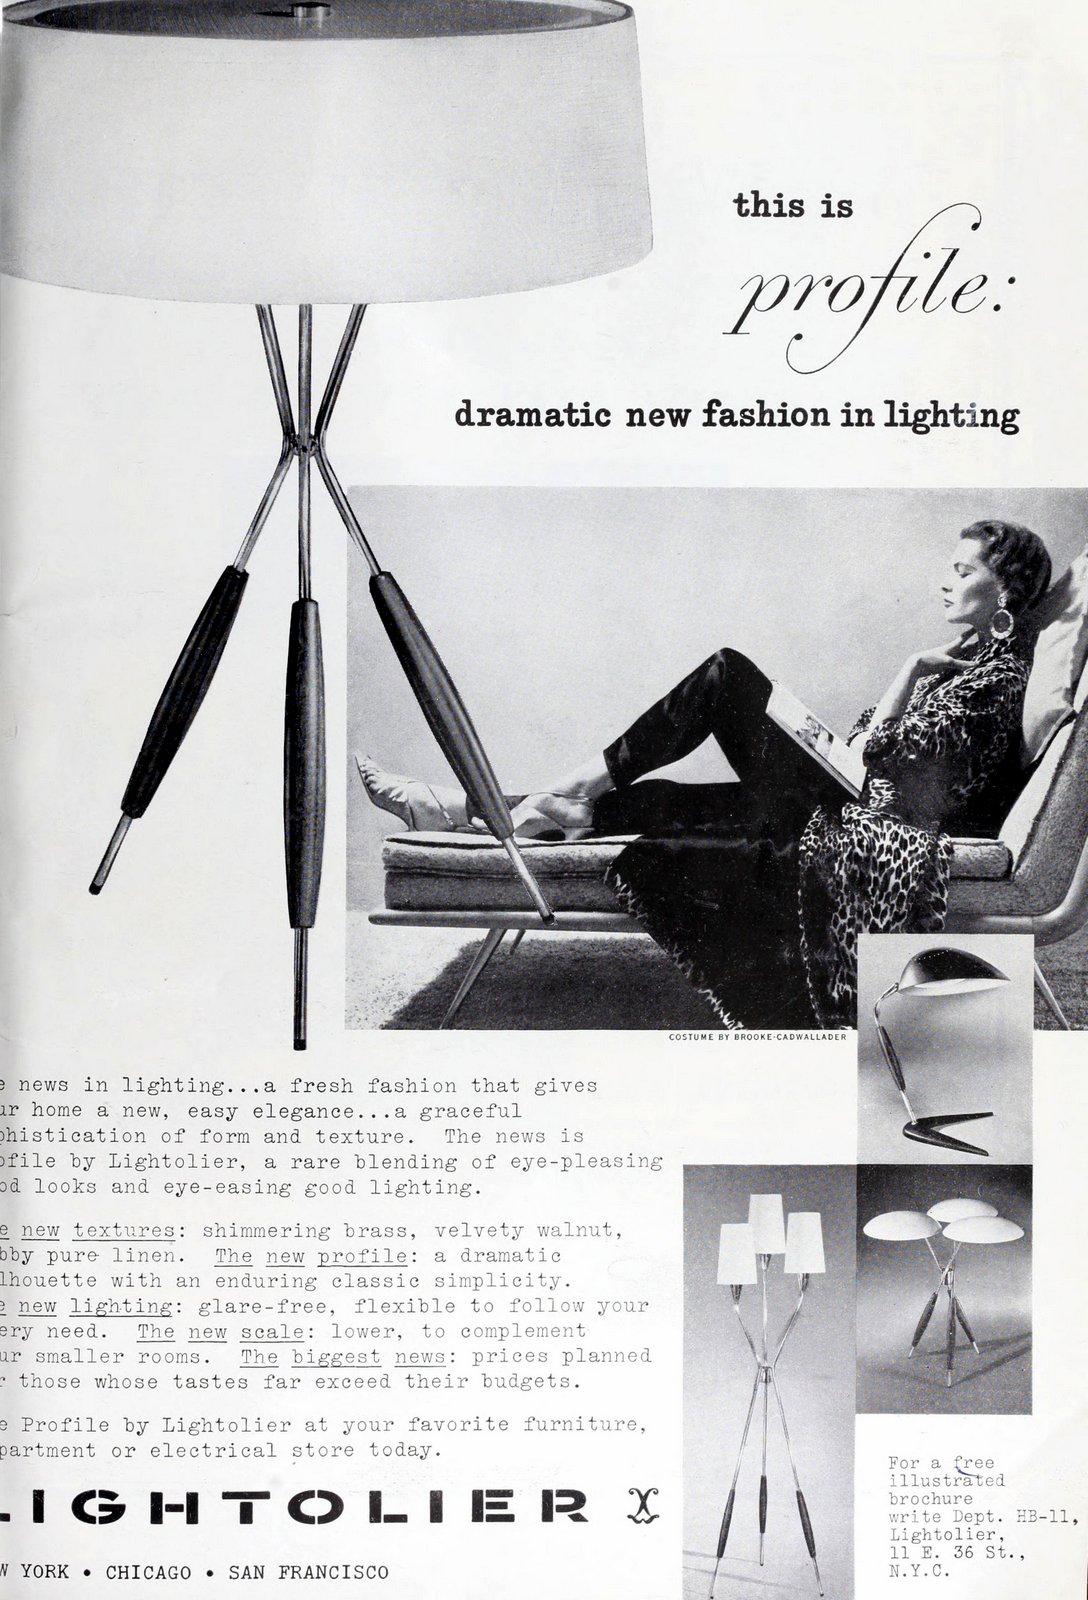 Modern dramatic lighting fashions - Lamp from 1953